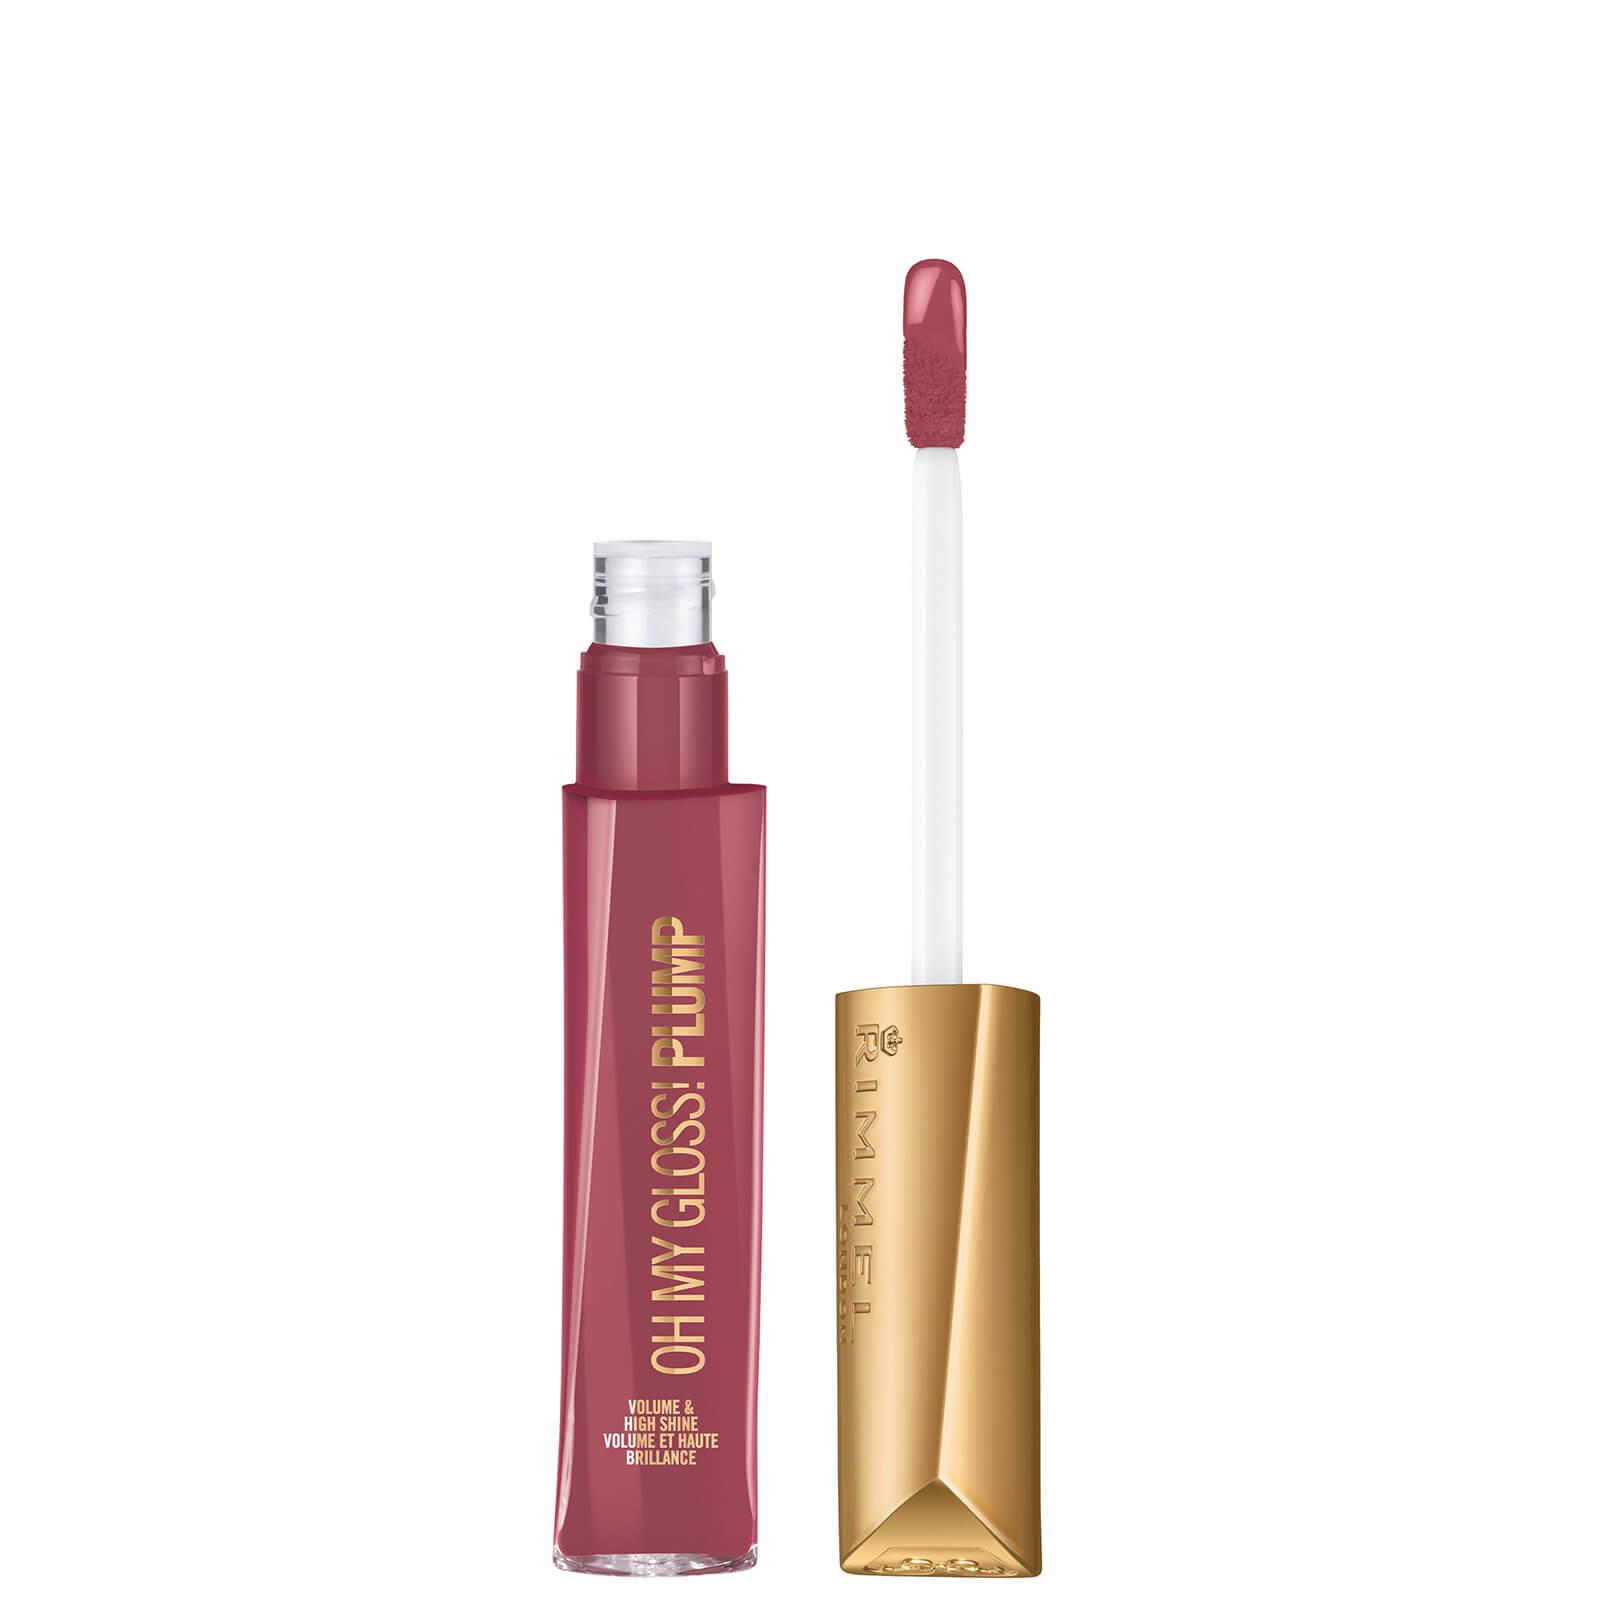 Купить Rimmel OMG! Plump Lip Gloss 6.5g (Various Shades) - 211 Mauve Mama